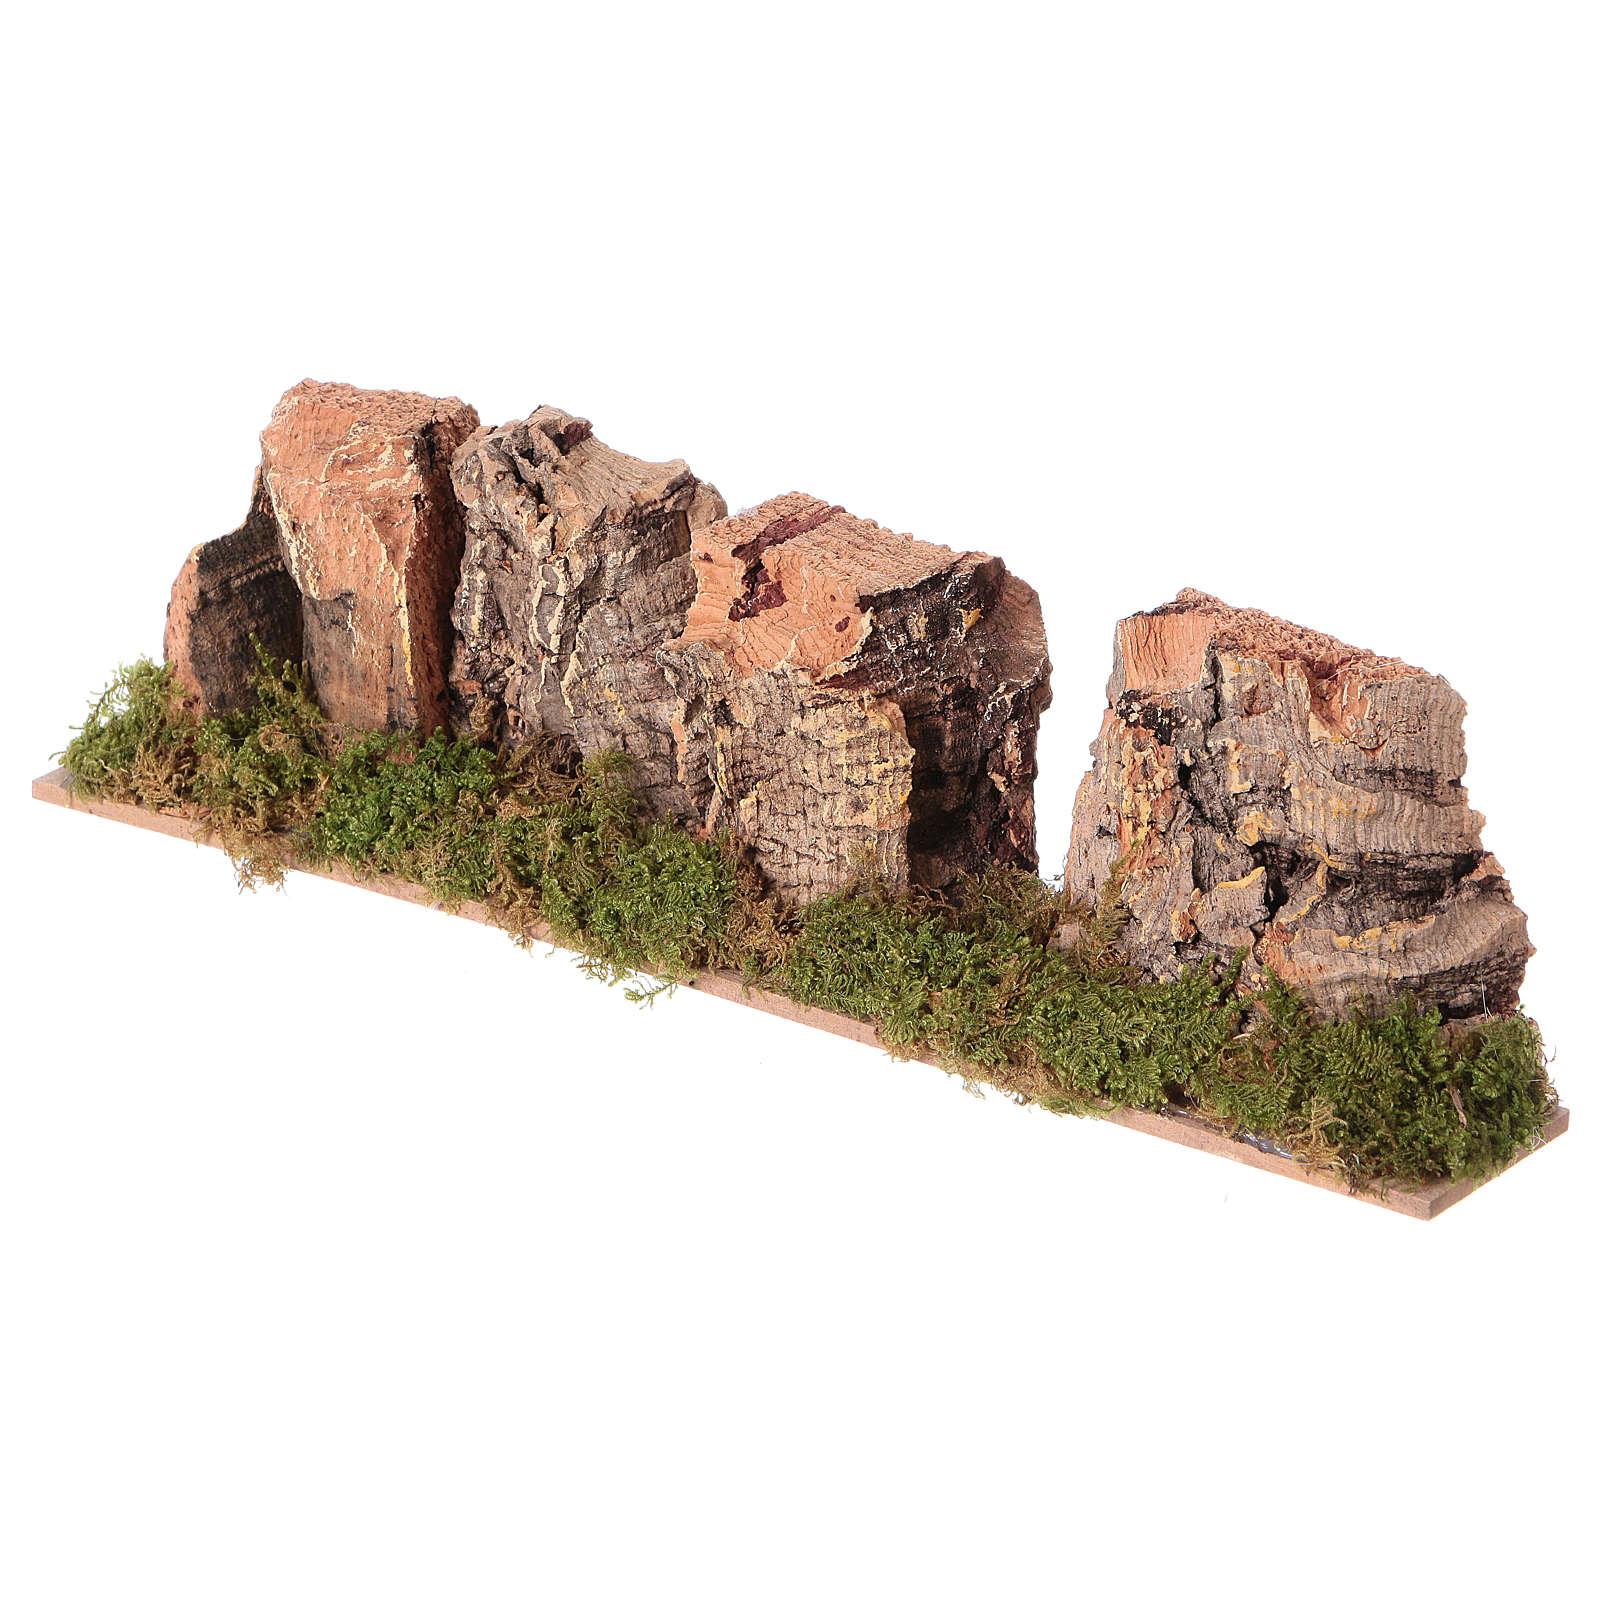 Nativity setting, mountains in cork 4x24x6cm 4